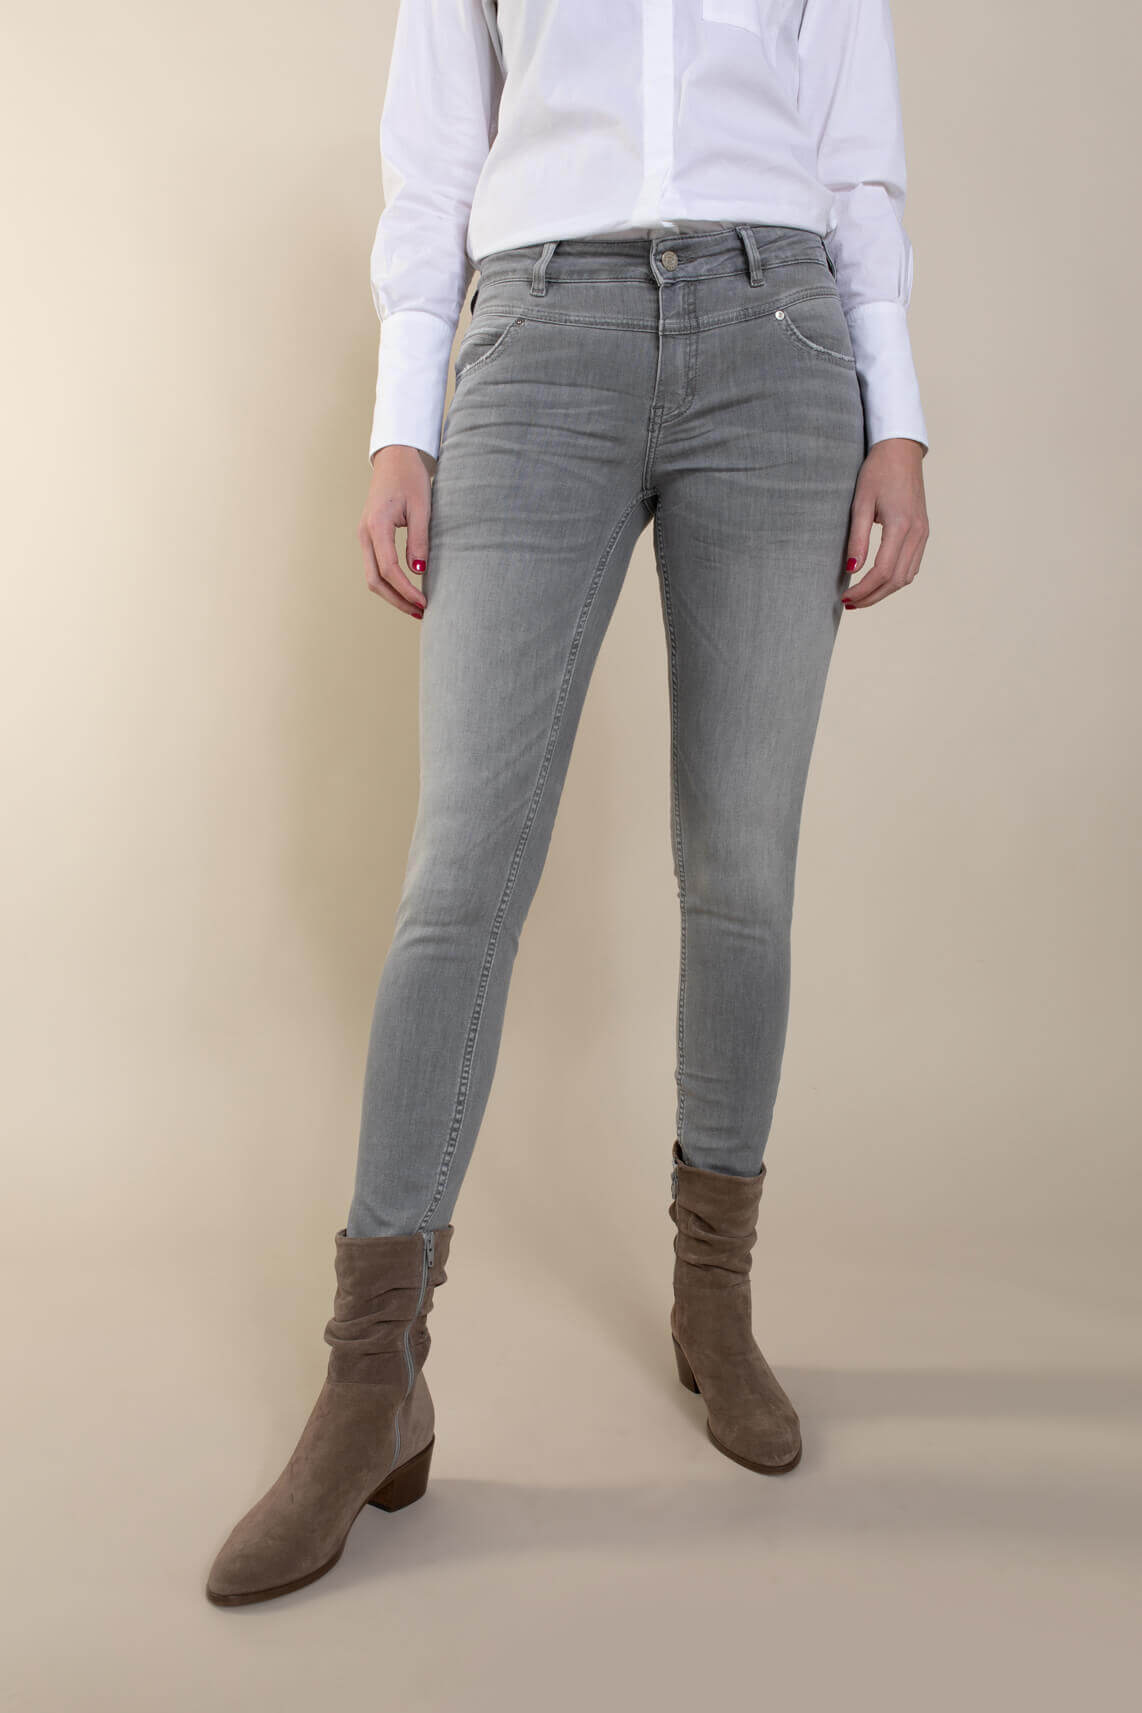 Rosner Dames L30 Antonia jeans Grijs